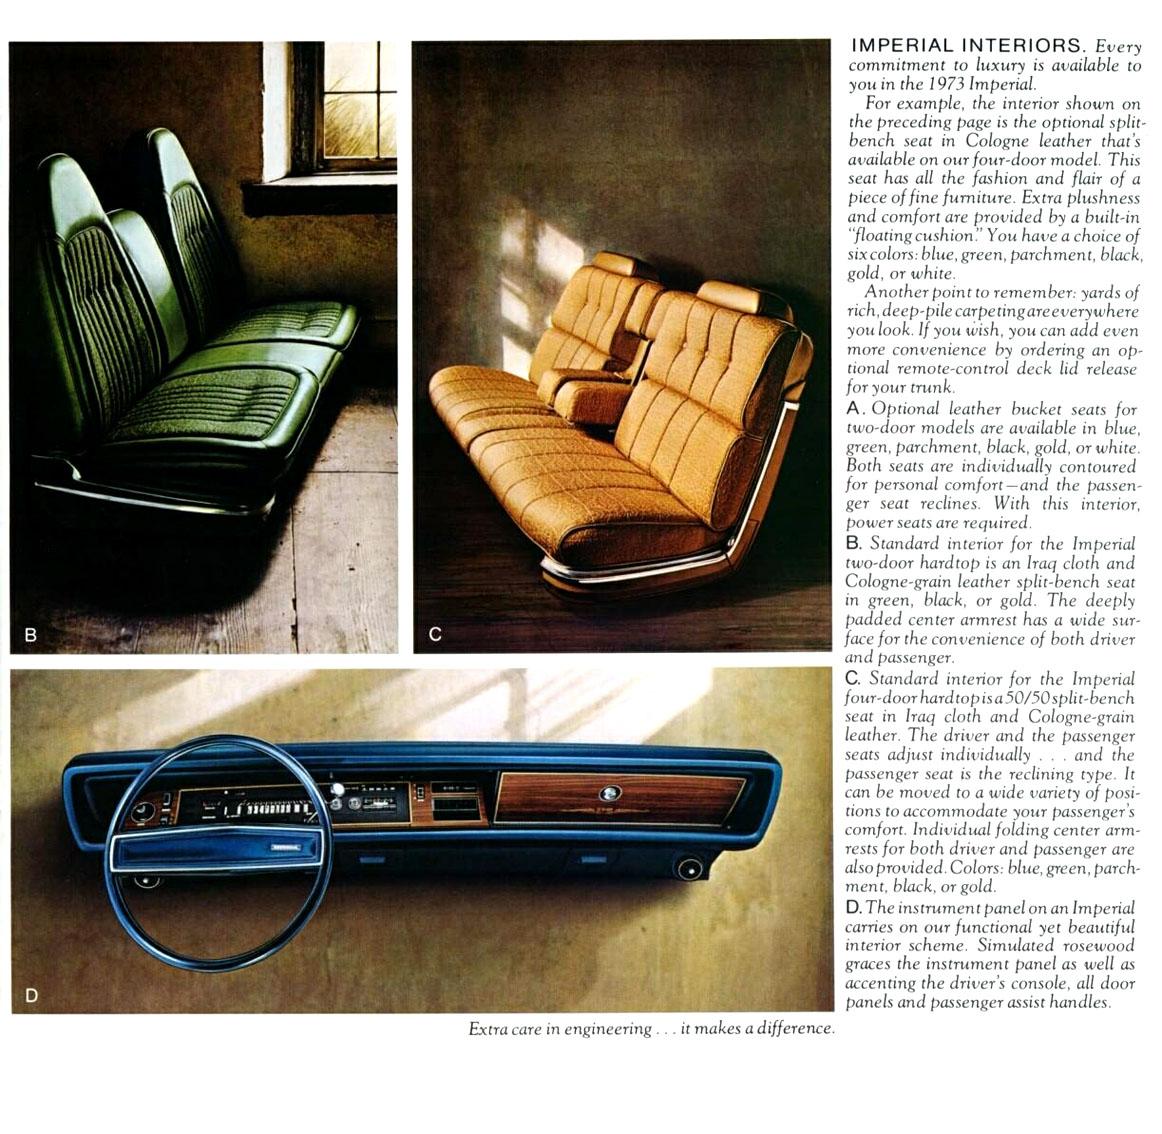 (Buick, 1960, cars, Detroit)